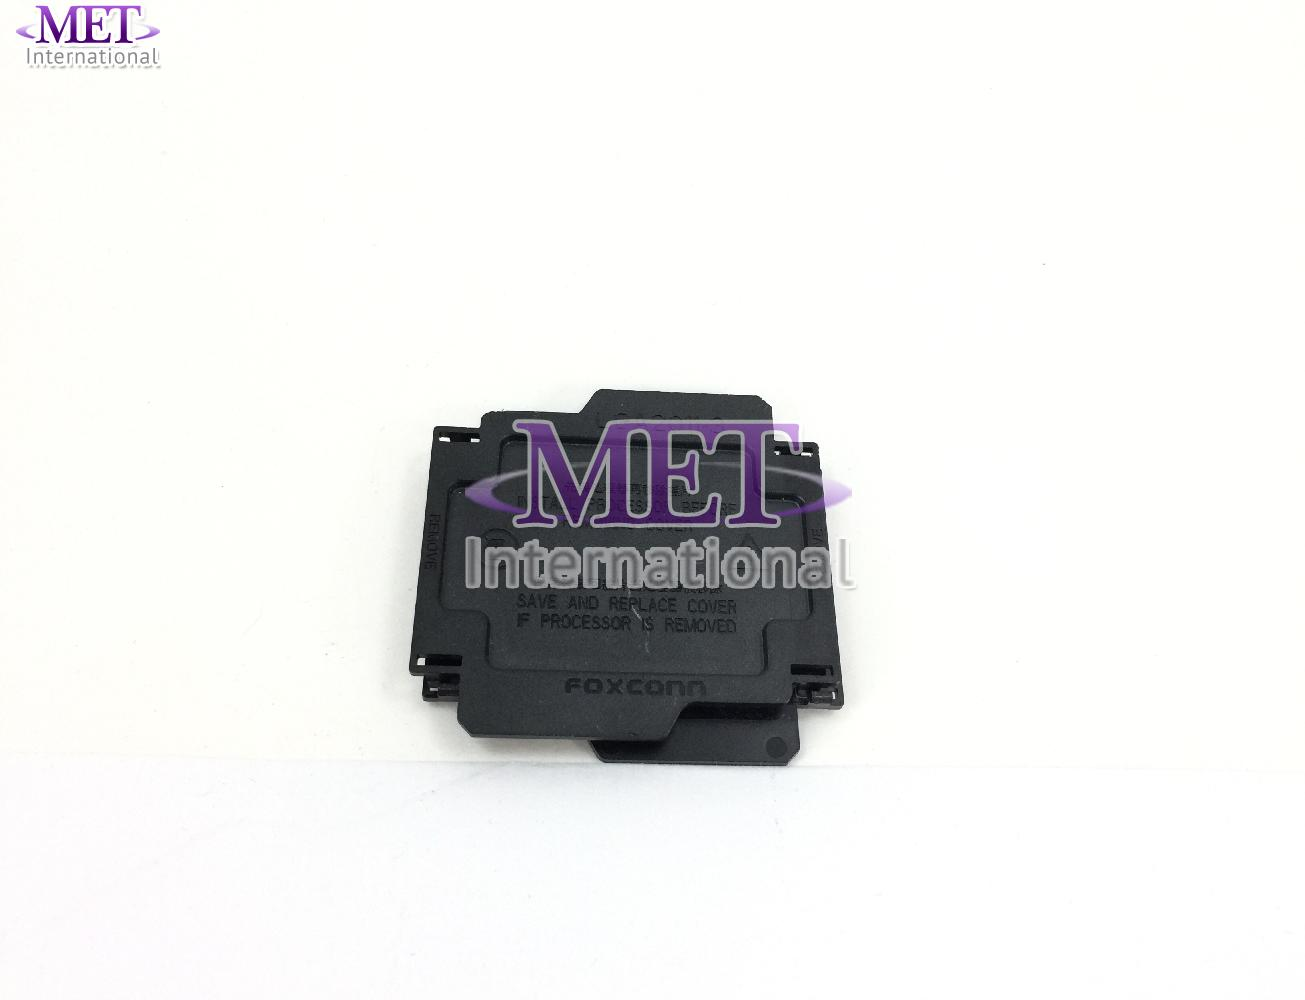 LOT OF 100 FOXCONN LGA2011-3 CPU SOCKET COVER